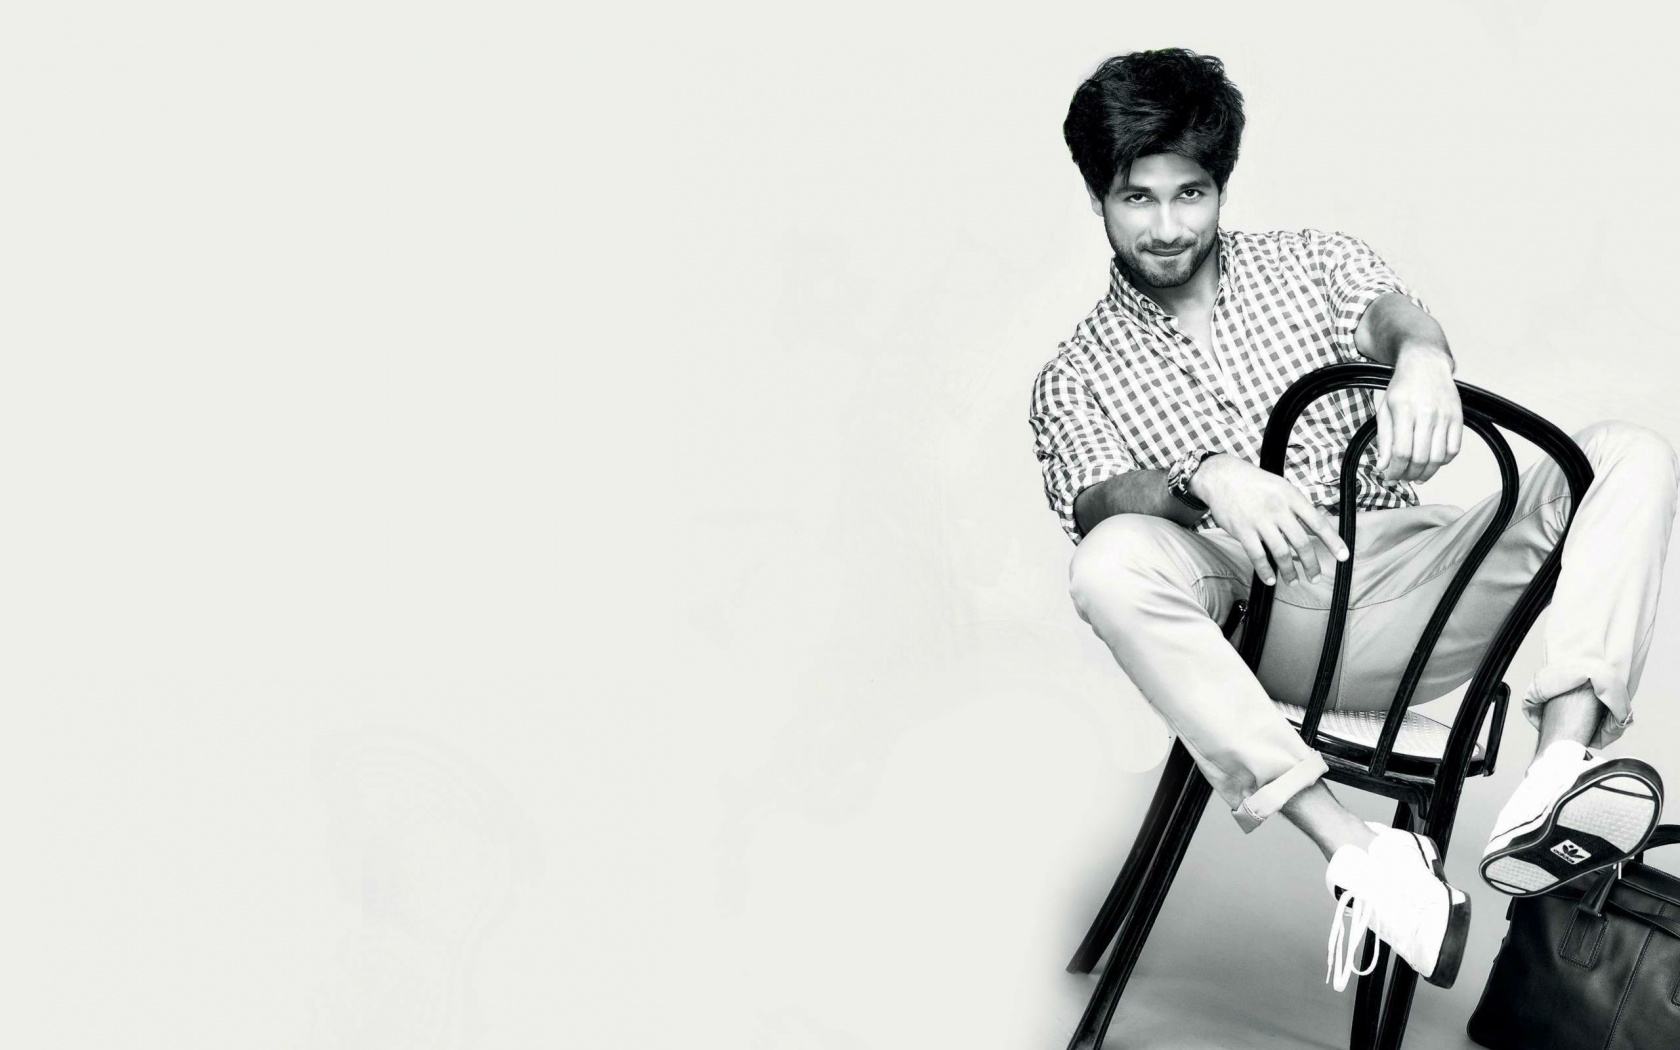 Shahid Kapoor Images